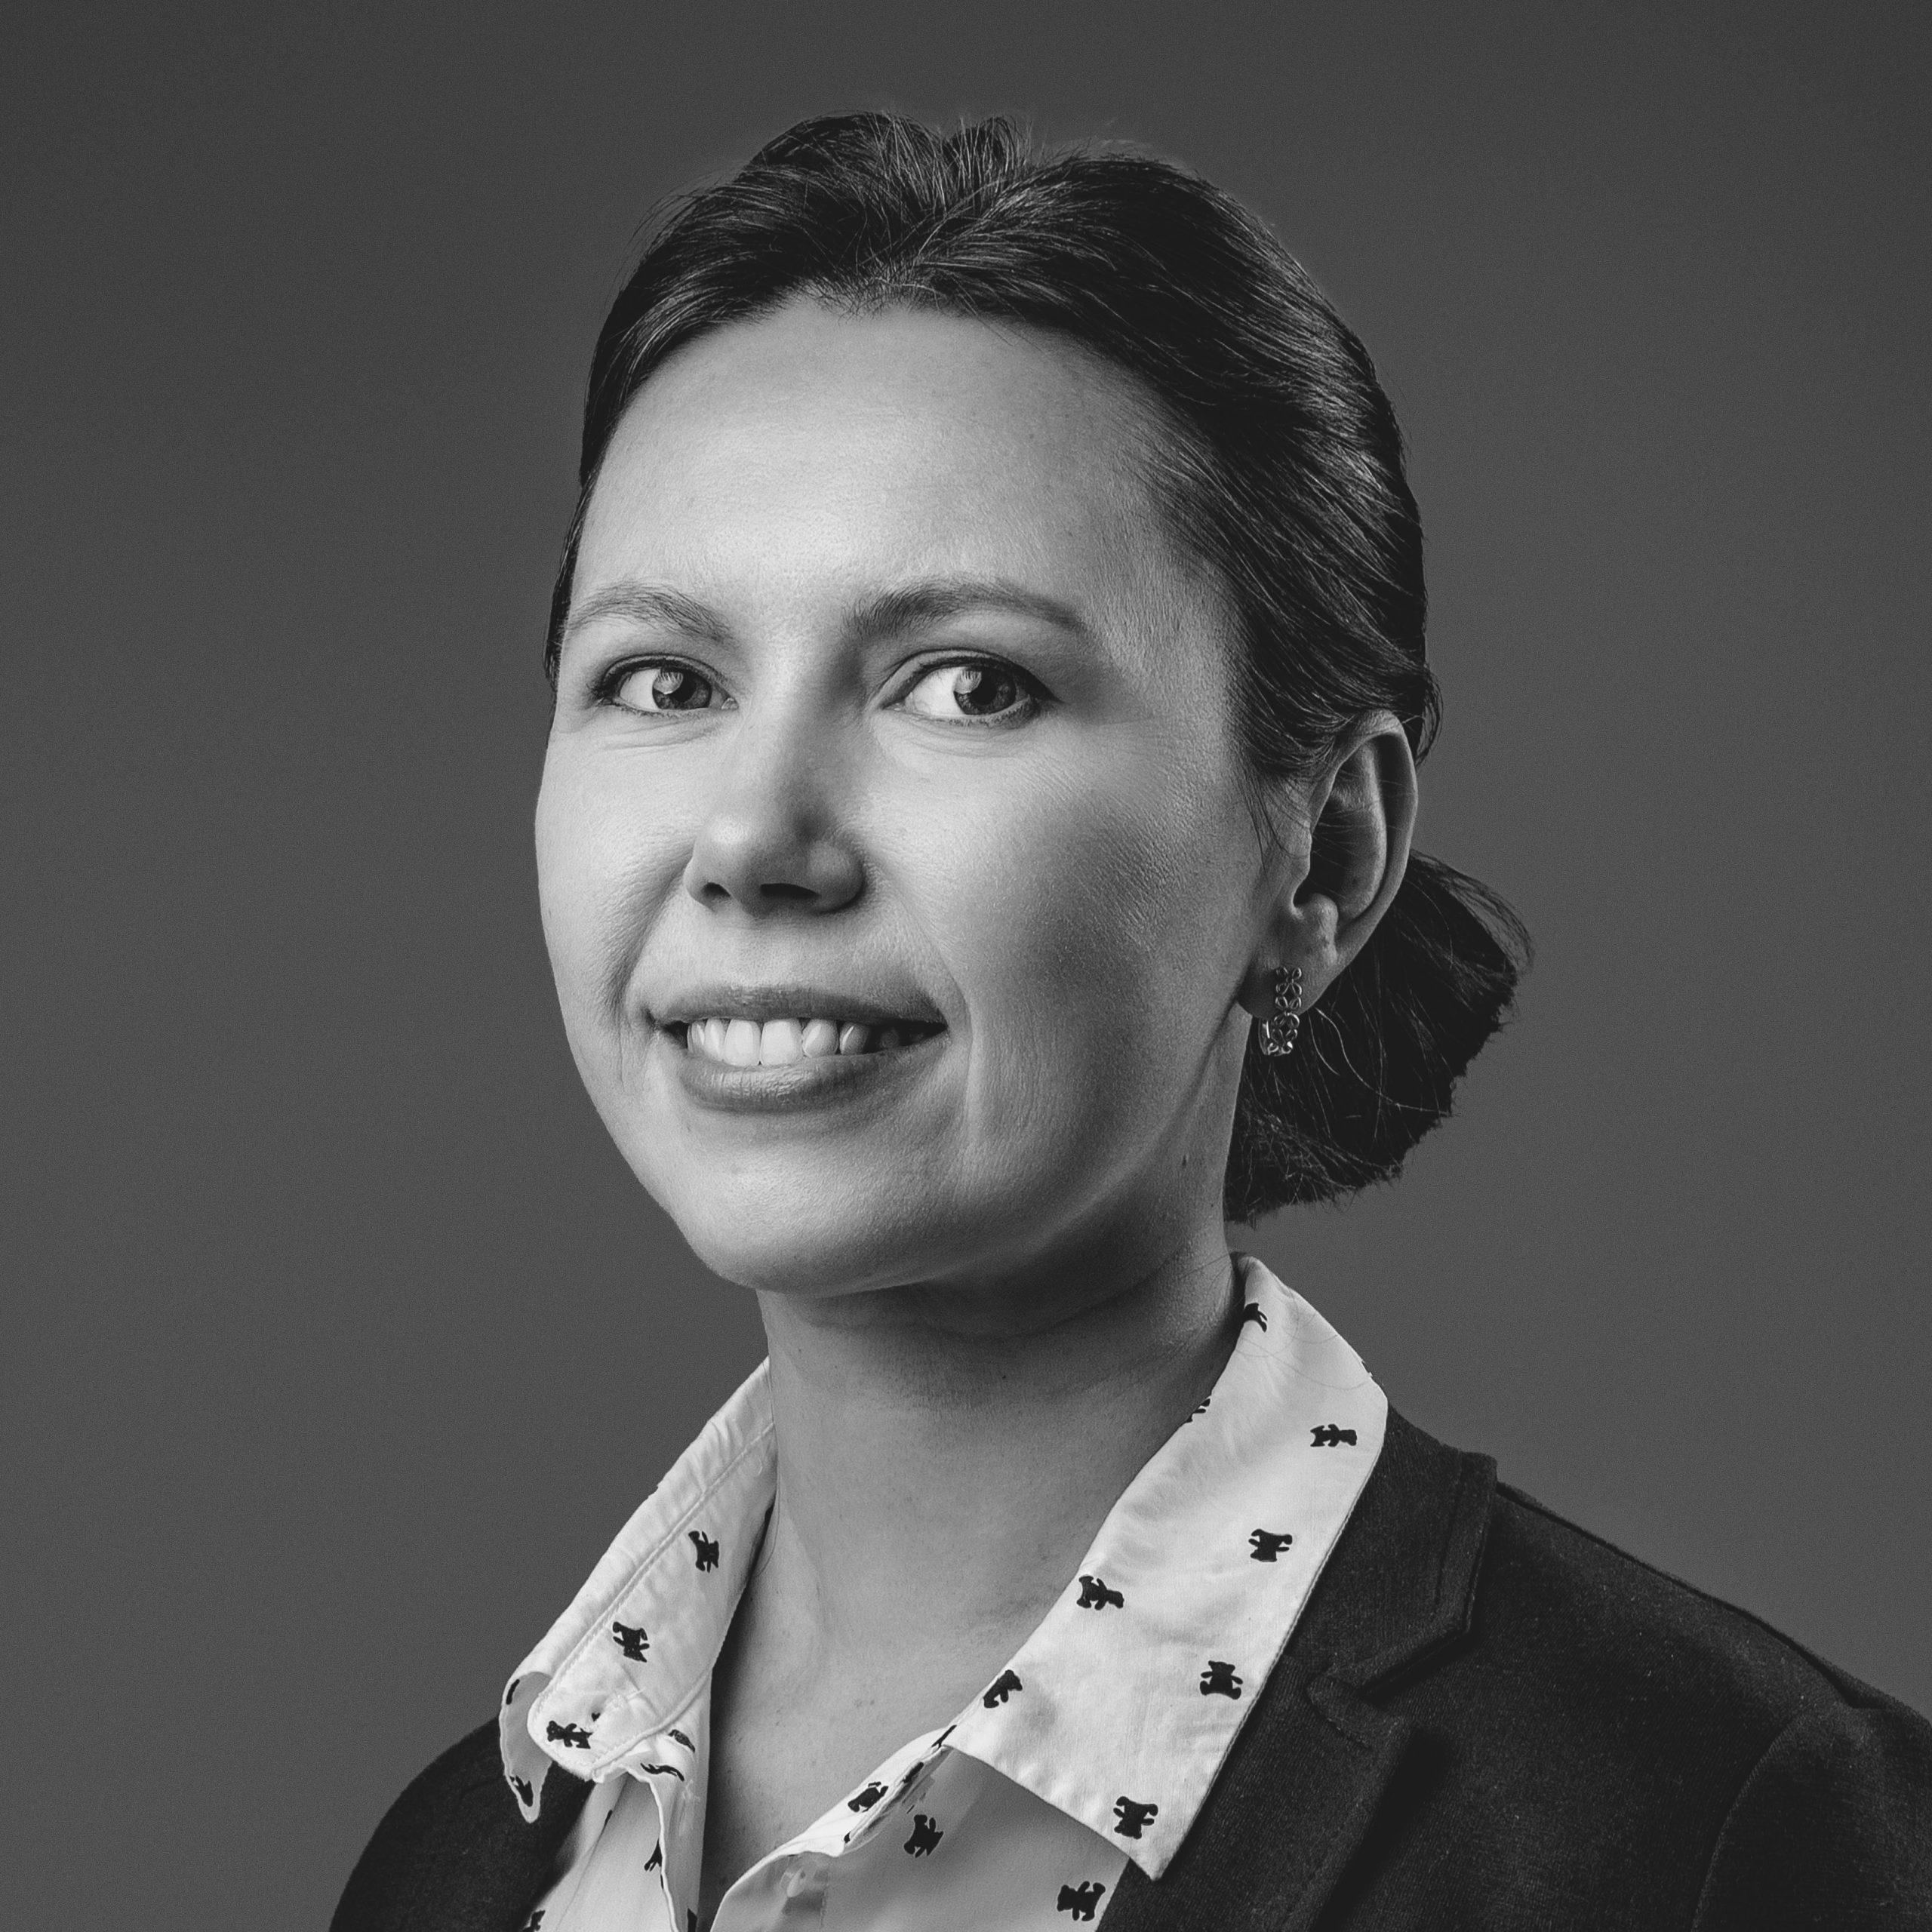 Валерия Балдина